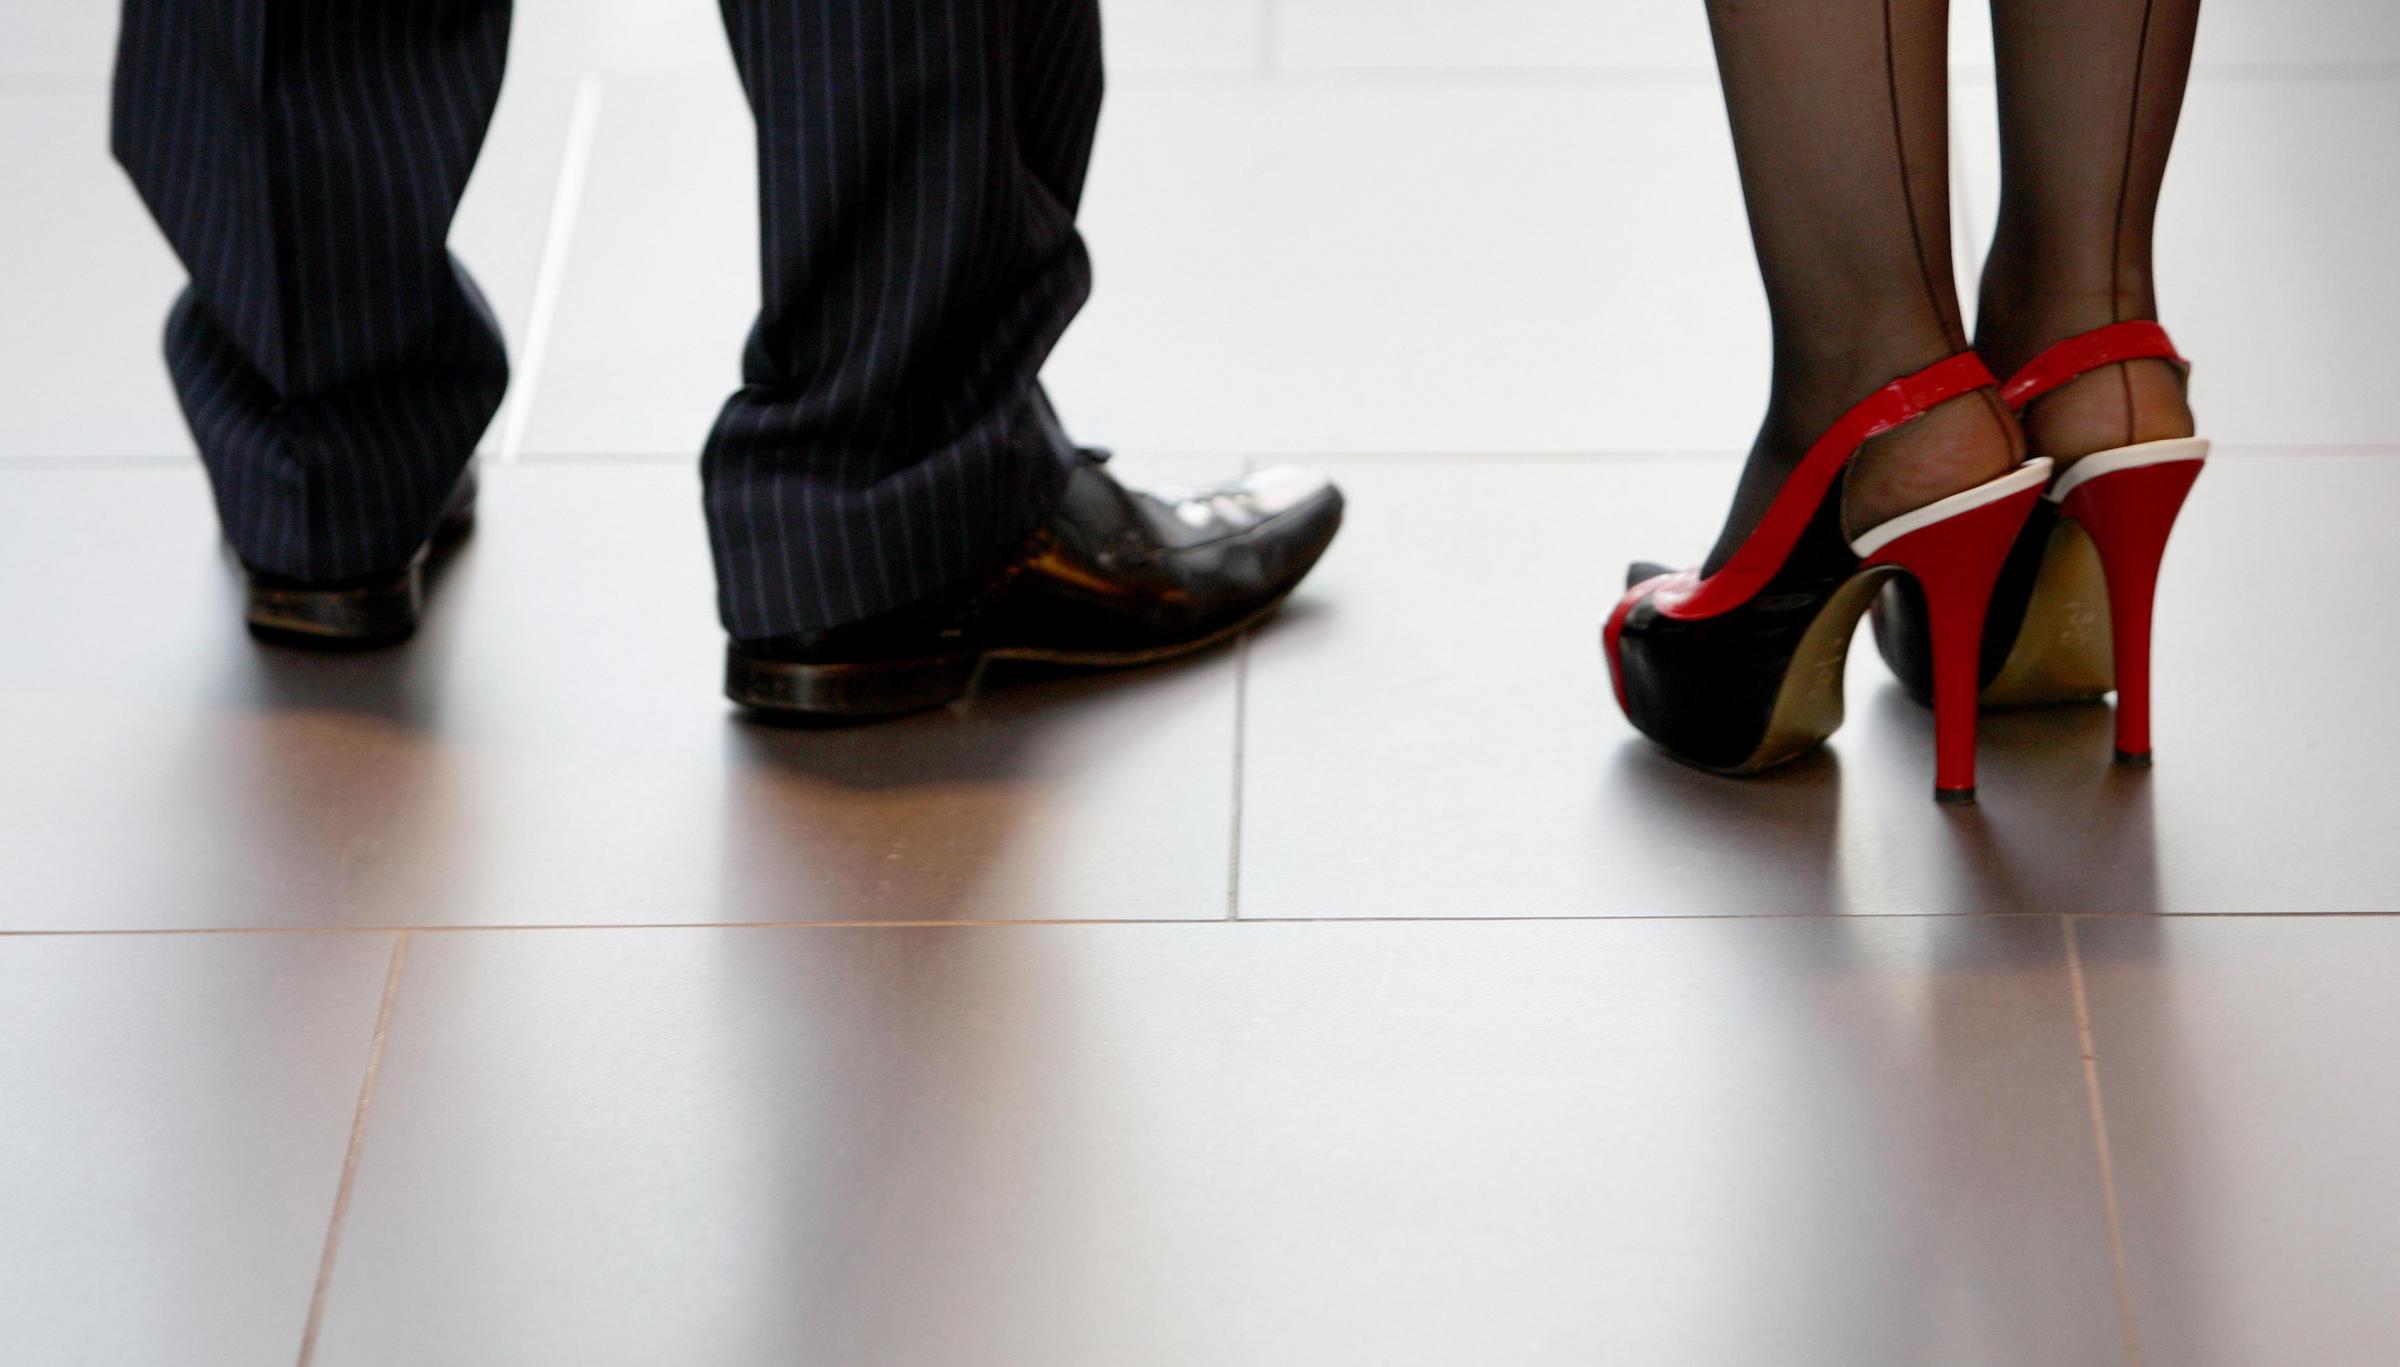 Women workers dress code study